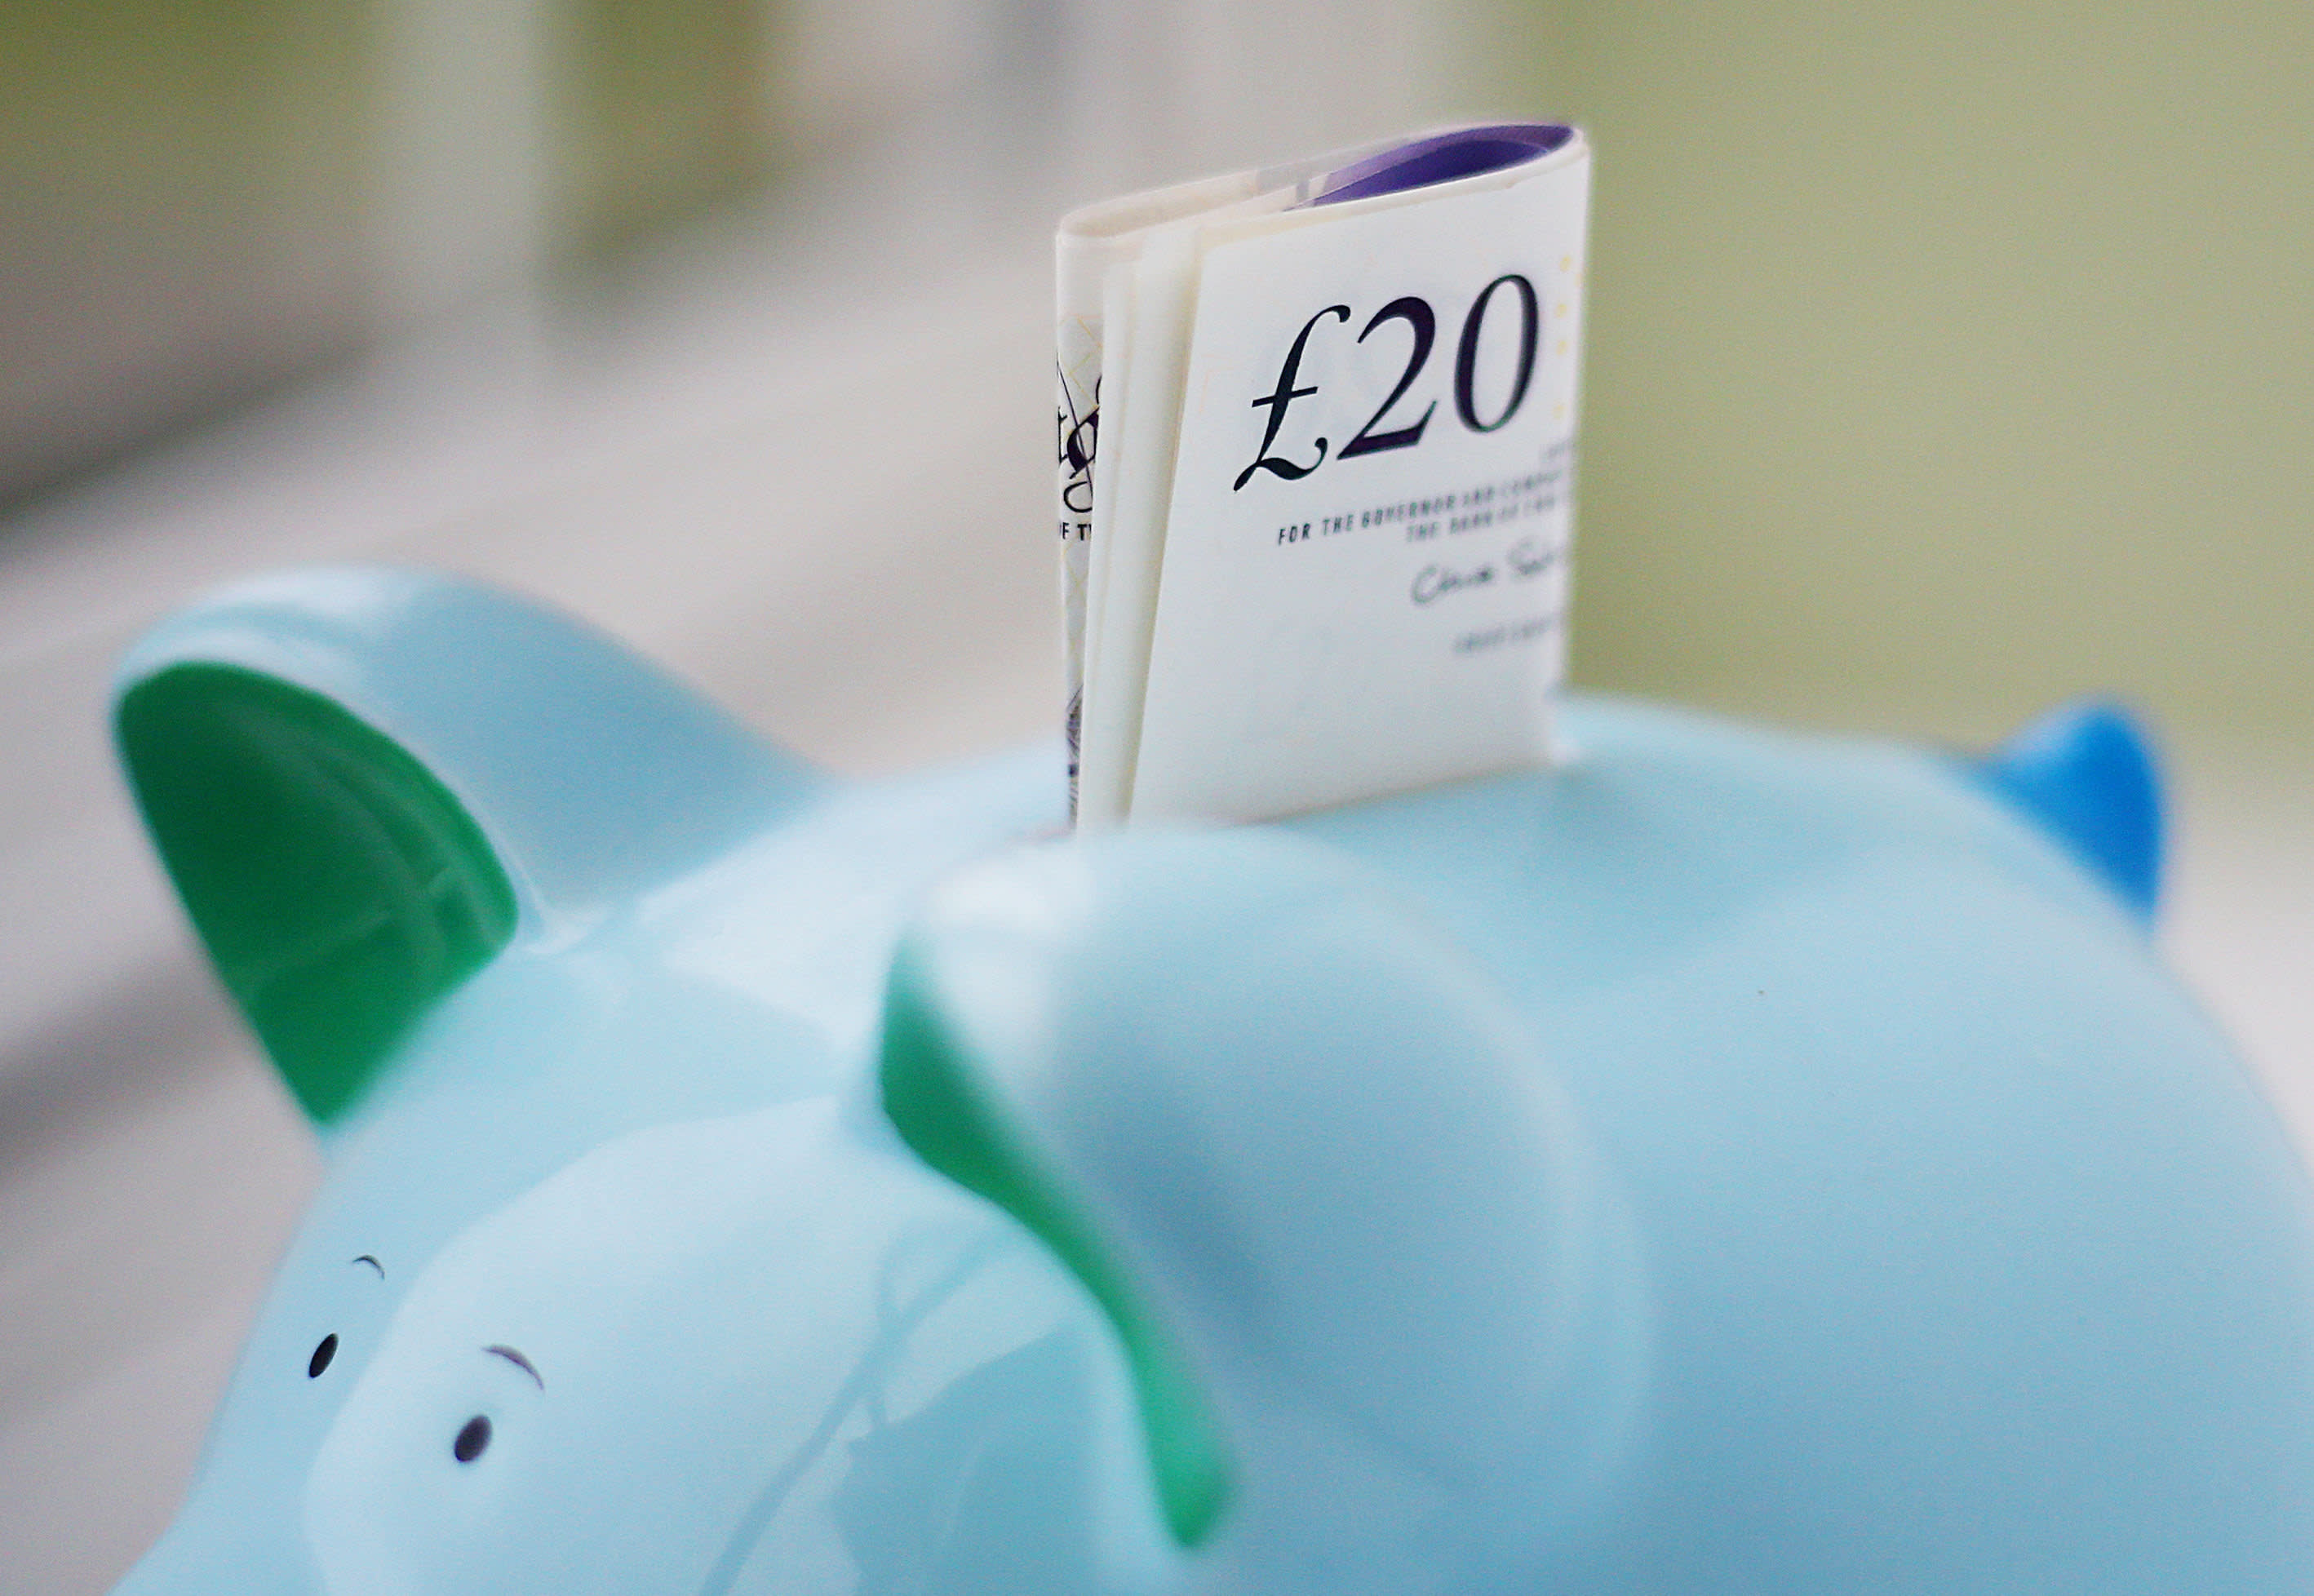 Jargon blamed for lack of pension saving